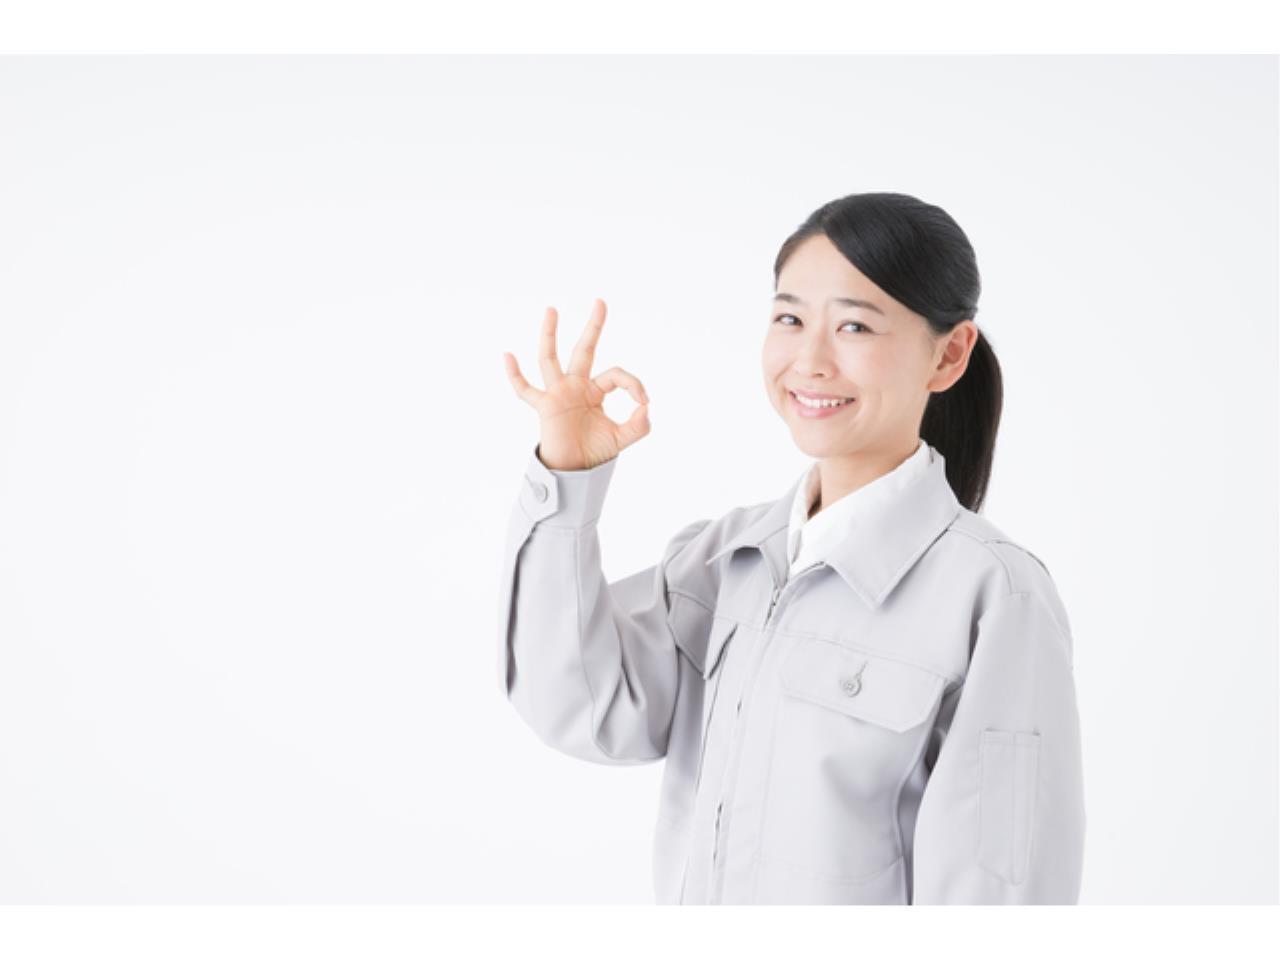 倉敷化工株式会社 防振ゴムの製造